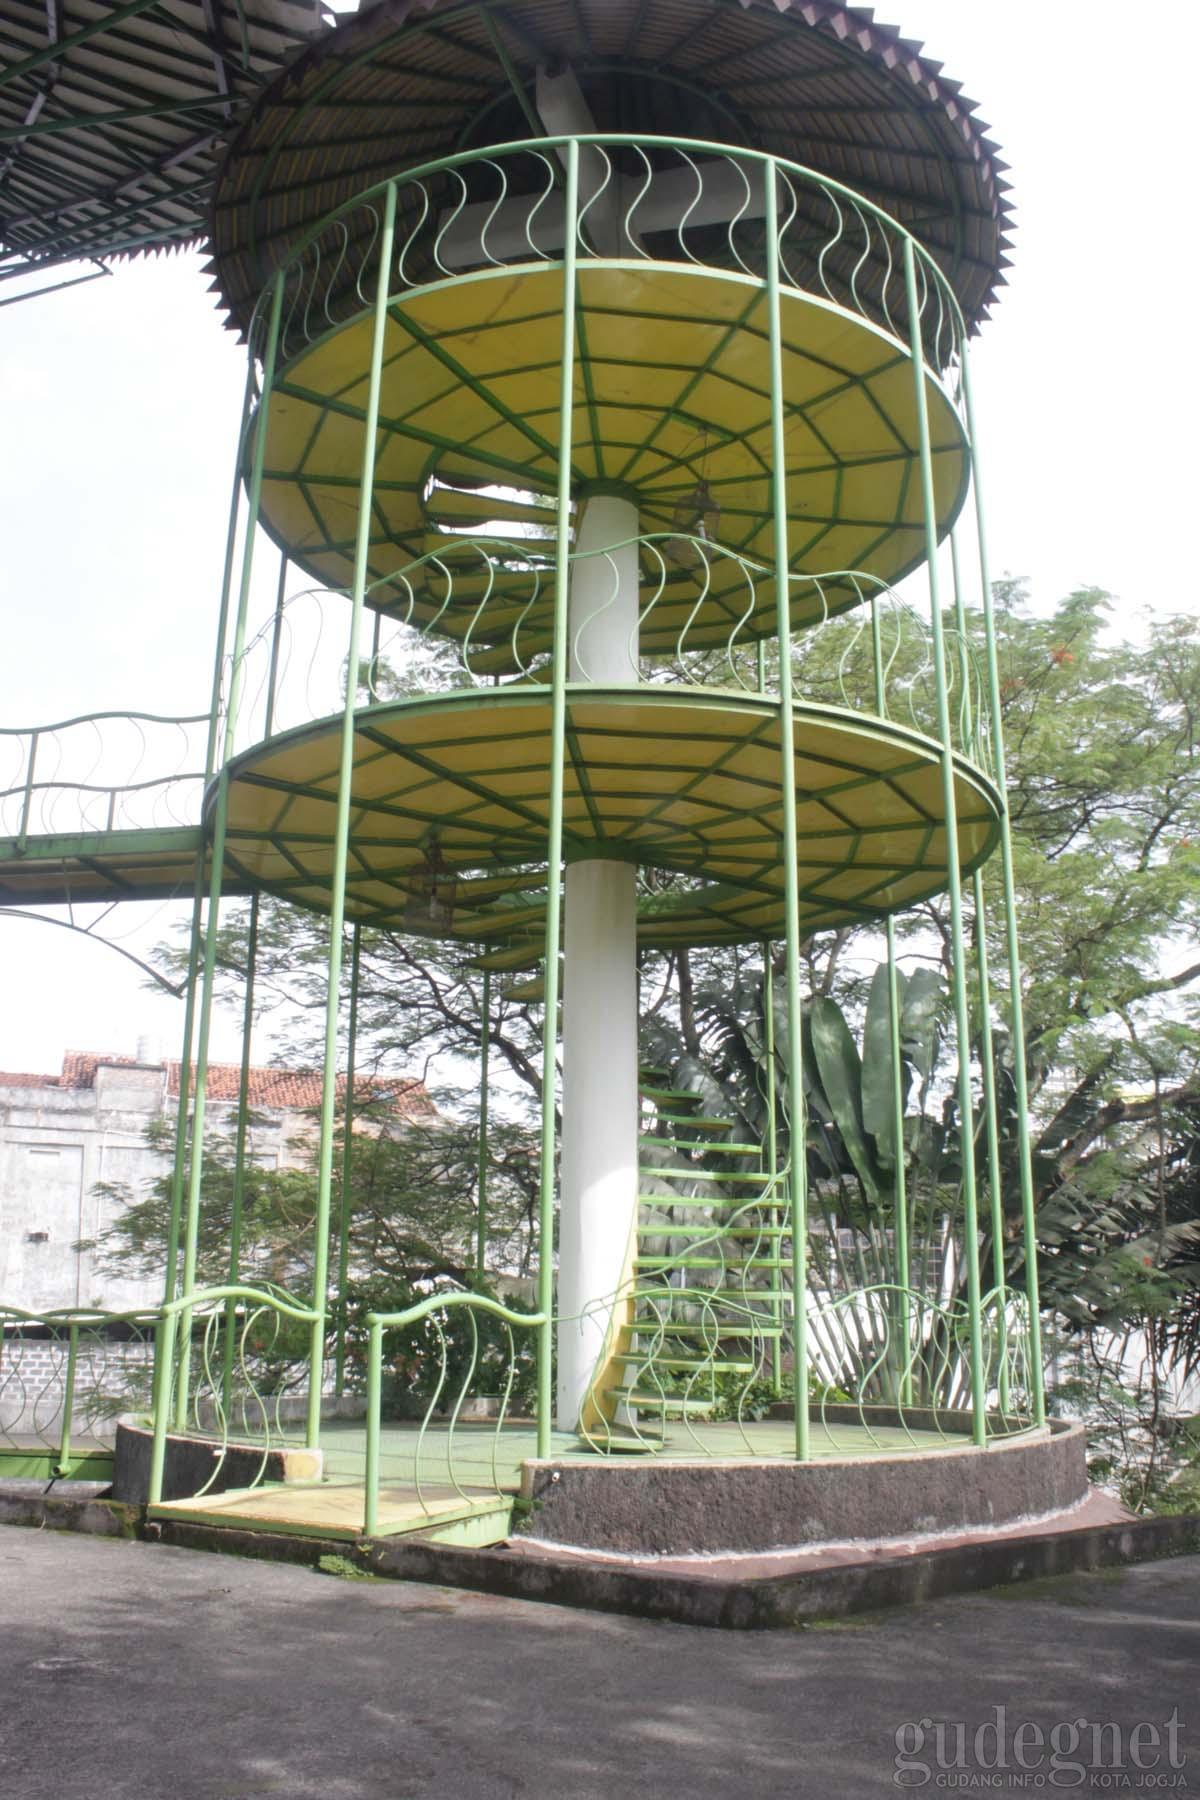 Museum Lukis Affandi Yogyakarta Yogya Gudegnet Menara Komplek Kab Sleman